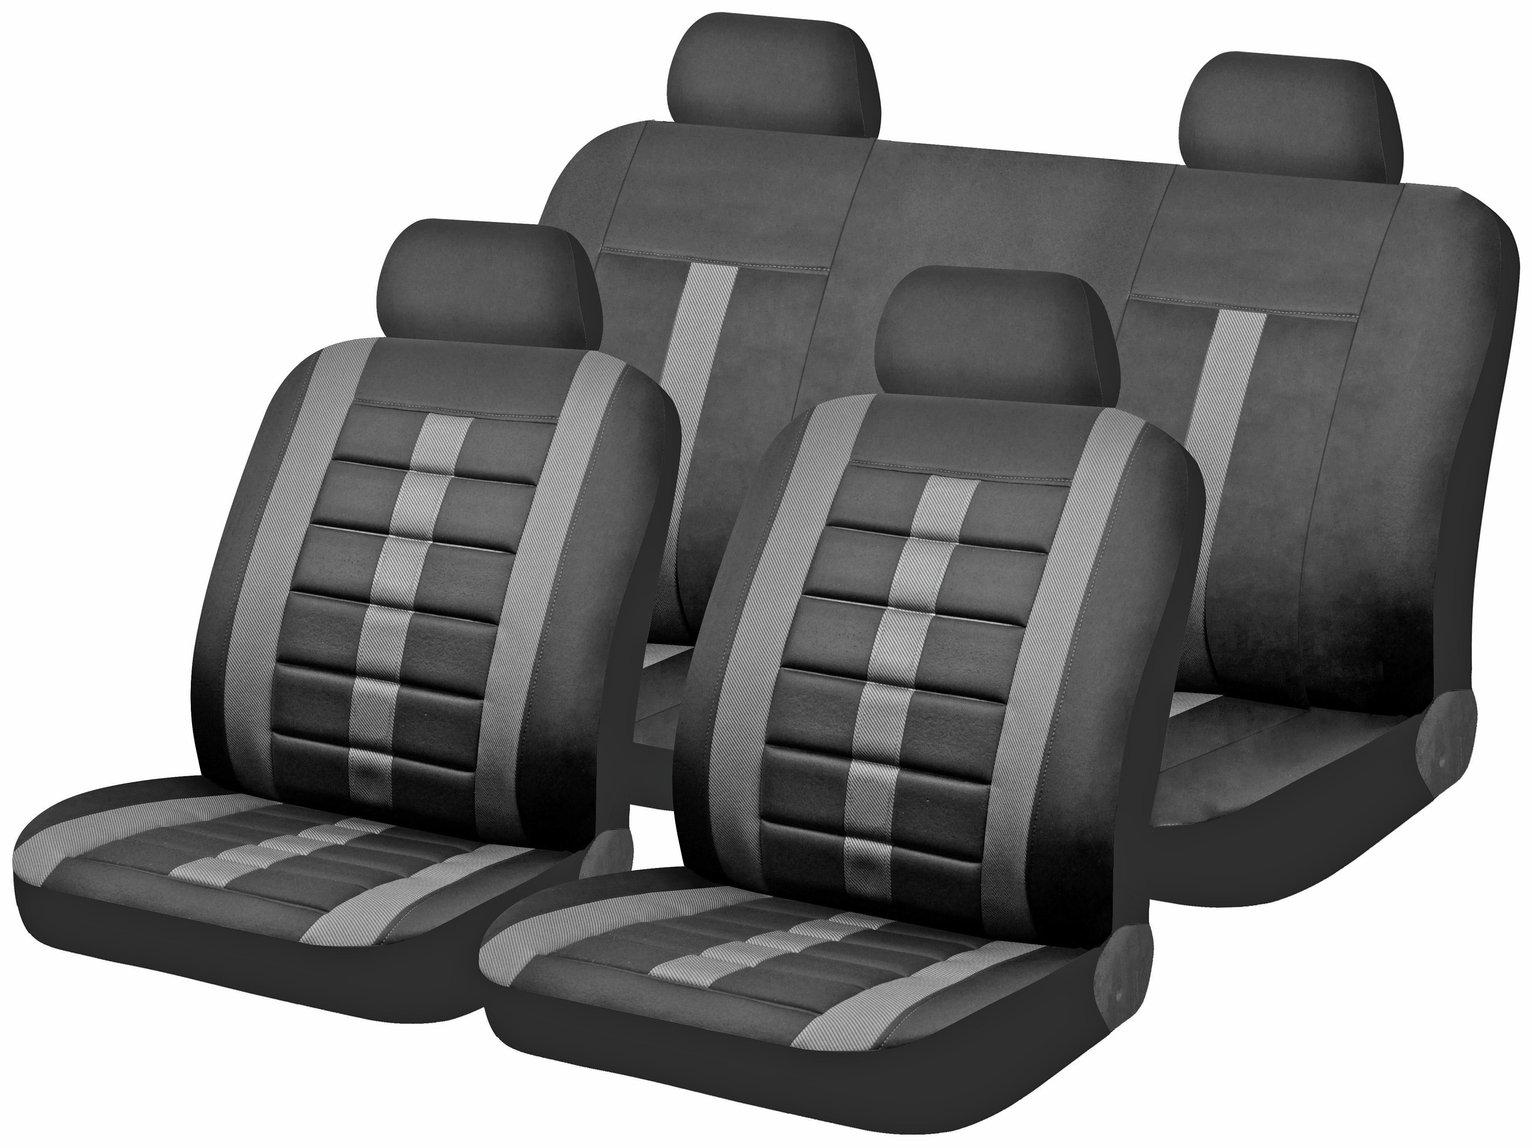 Delightful Lumbar Foam Support Car Seat Covers   Black